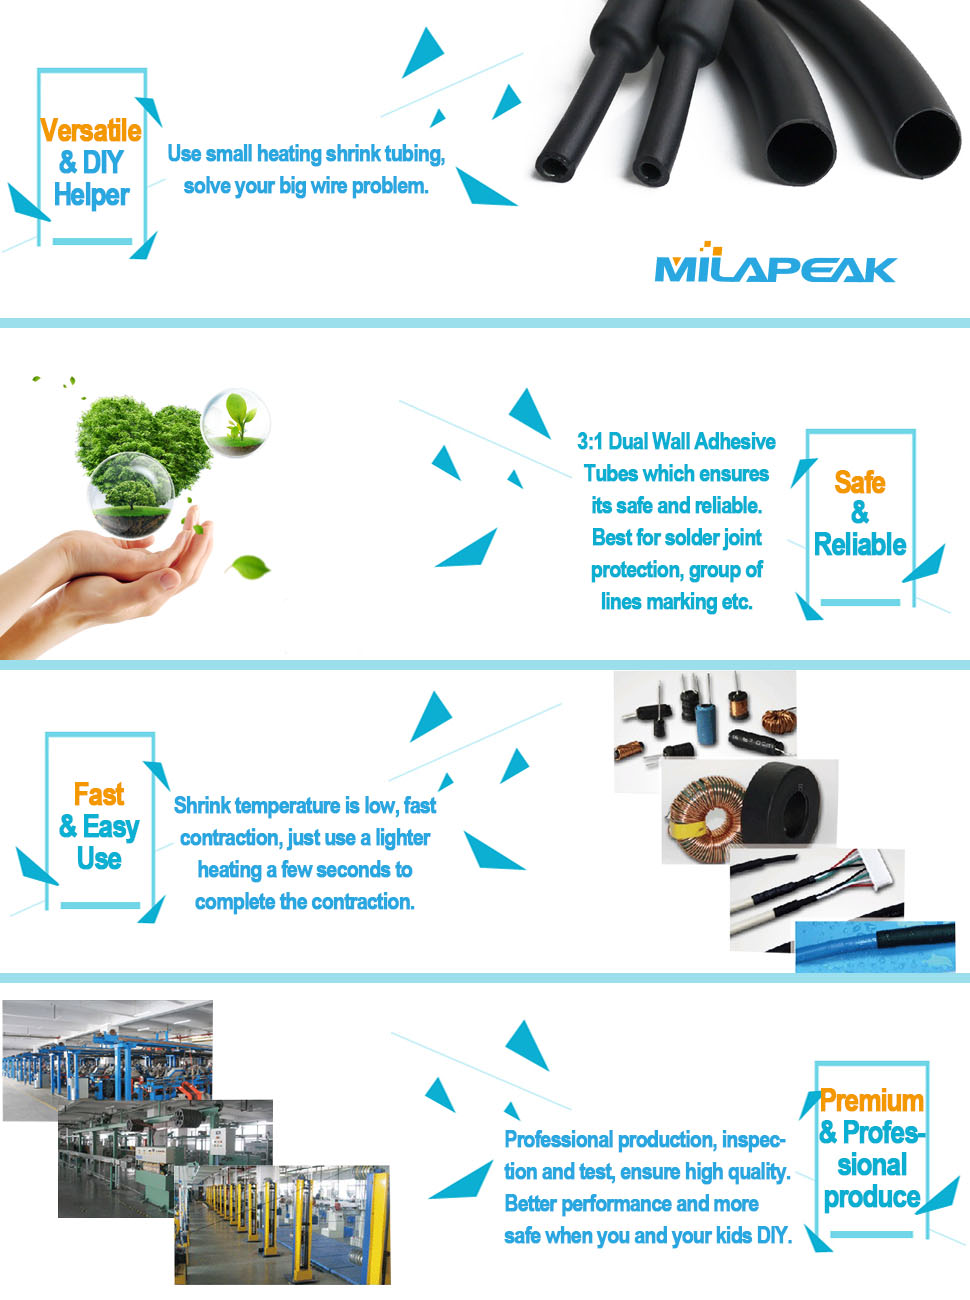 MILAPEAK 31 Dual Wall Adhesive Lined Heat Shrink Tubing Kit